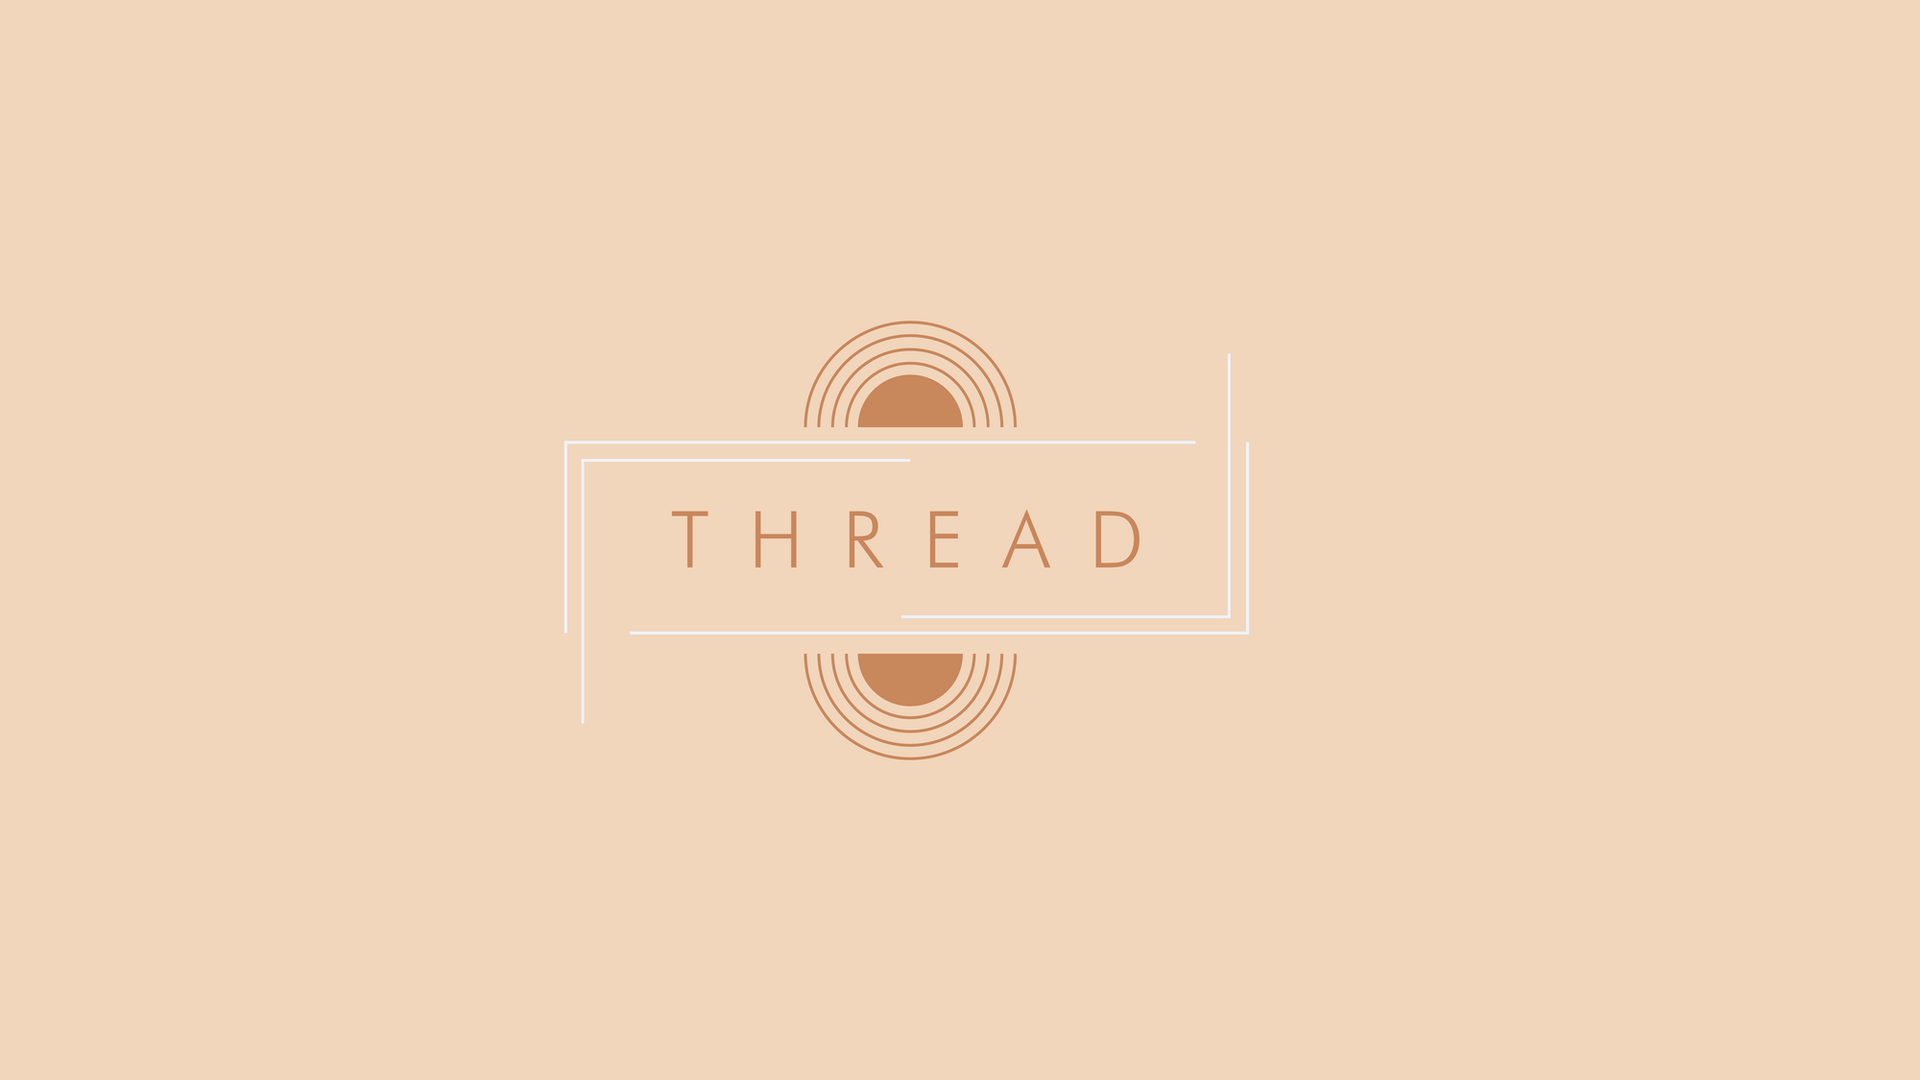 thread website logo-01.png